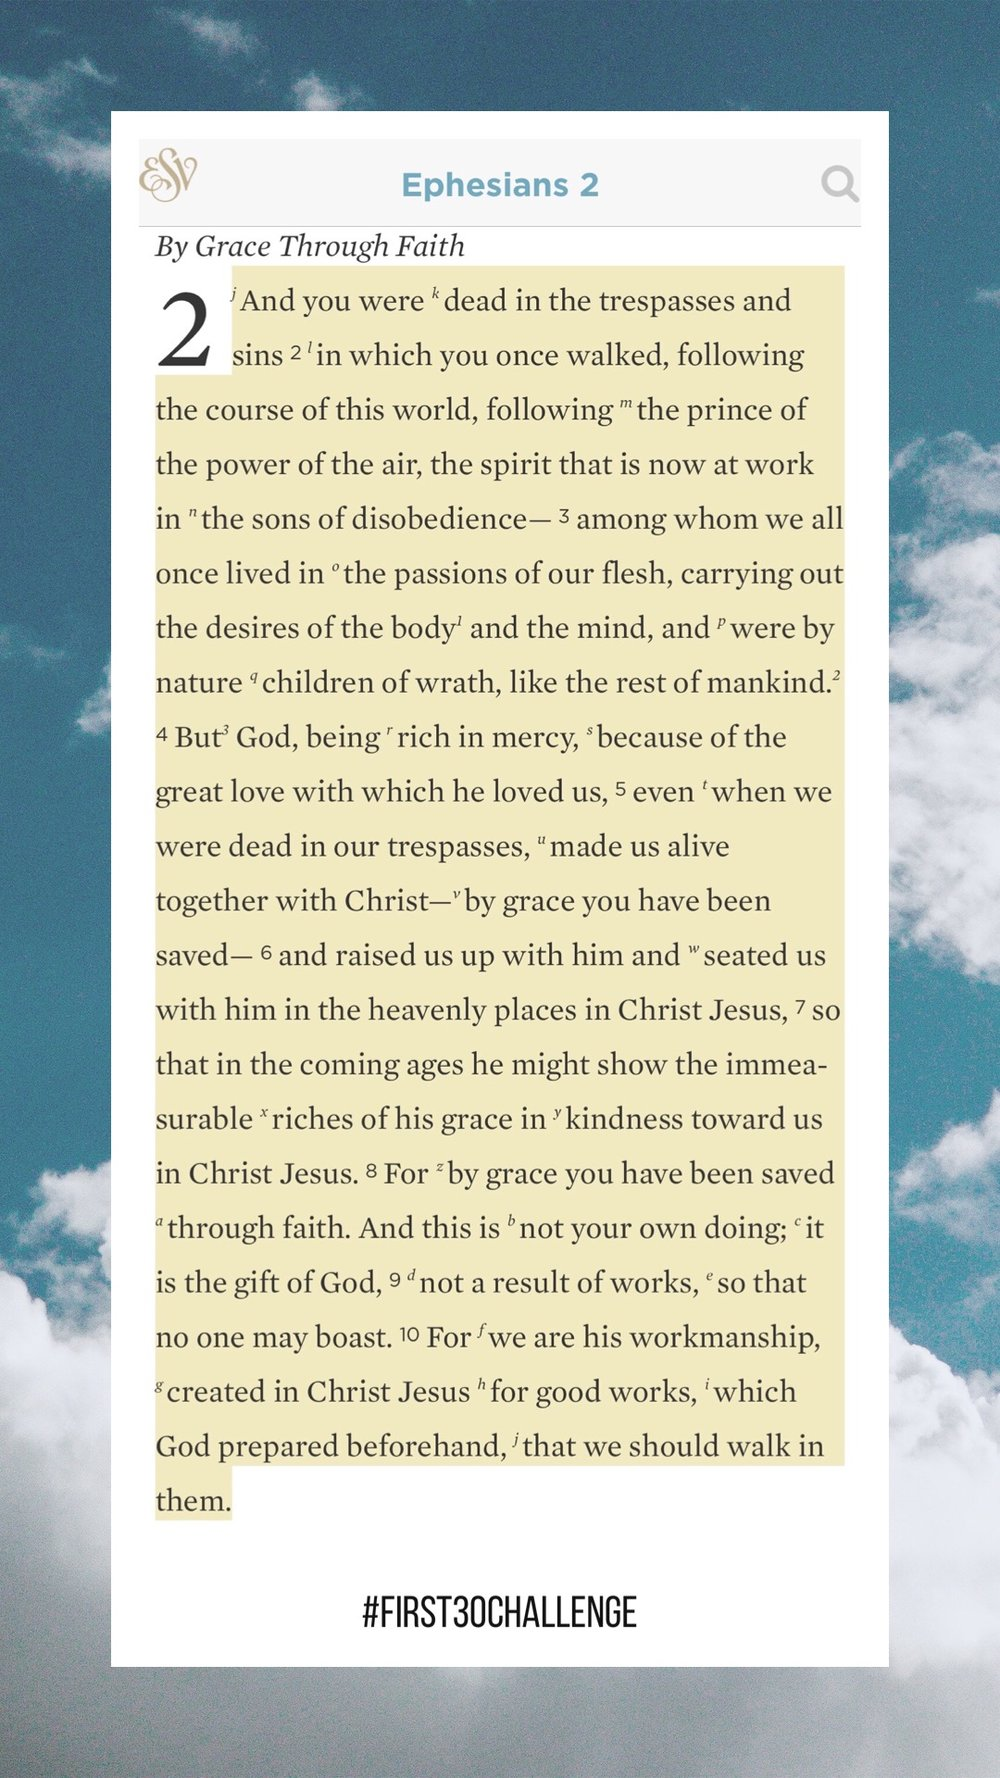 Ephesians 2: 1-10 - GOD, ALREADY PAID FOR OUR FREEDOM